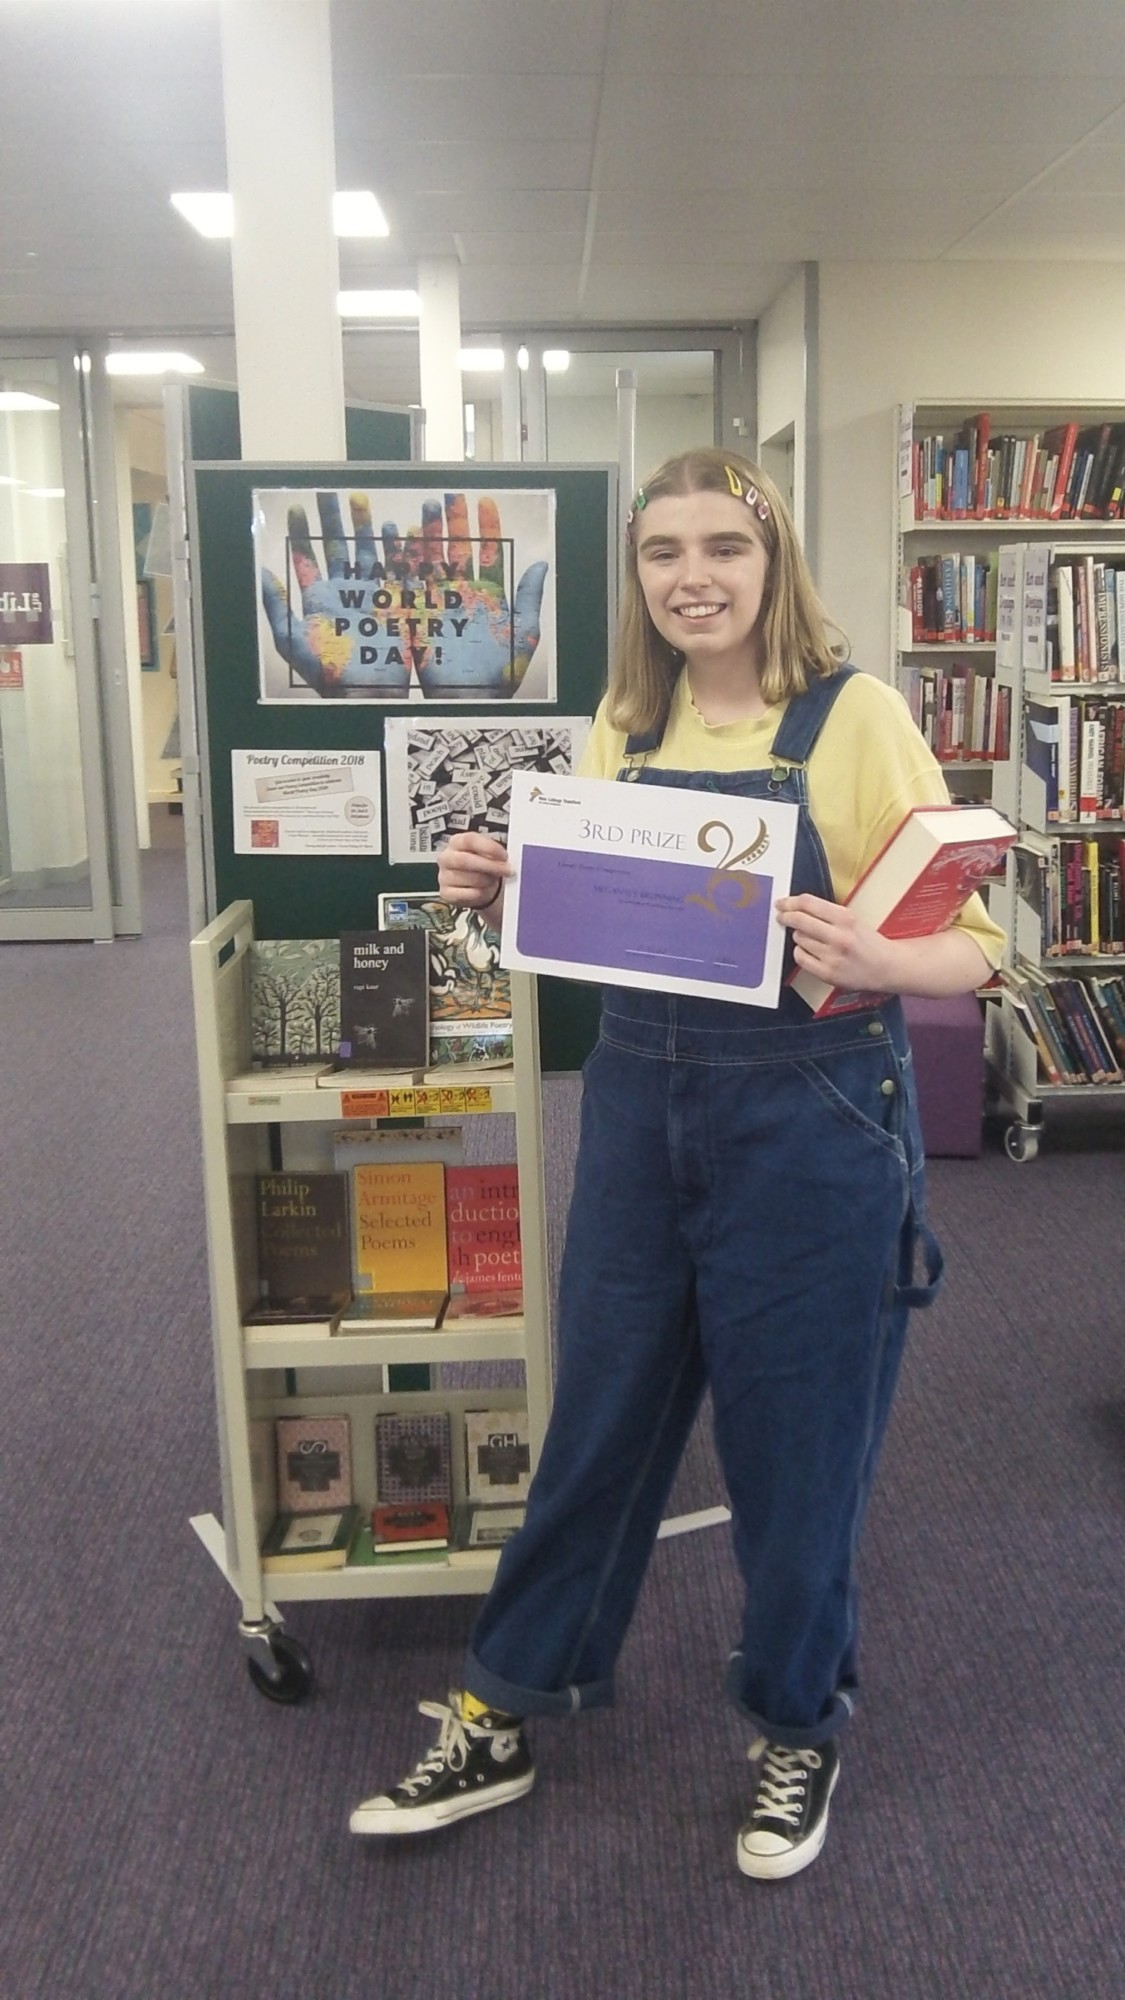 A-level-3rd-prize-winner-Megan-Brunning-e1524473130657